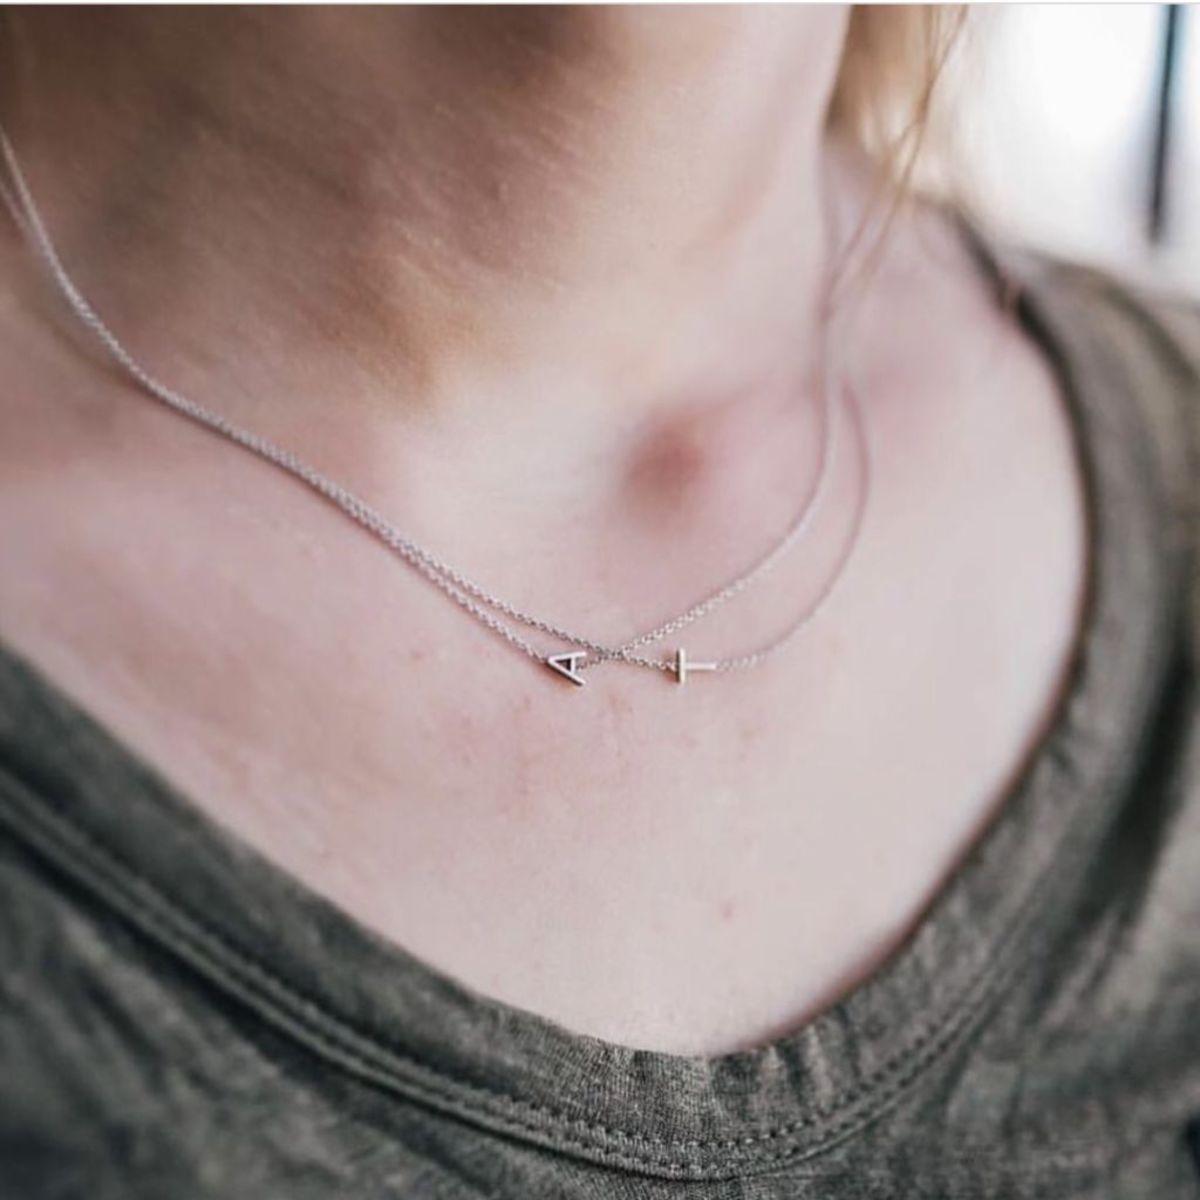 cbb11df93 Maya Brenner 14k Letter Necklace | Garmentory